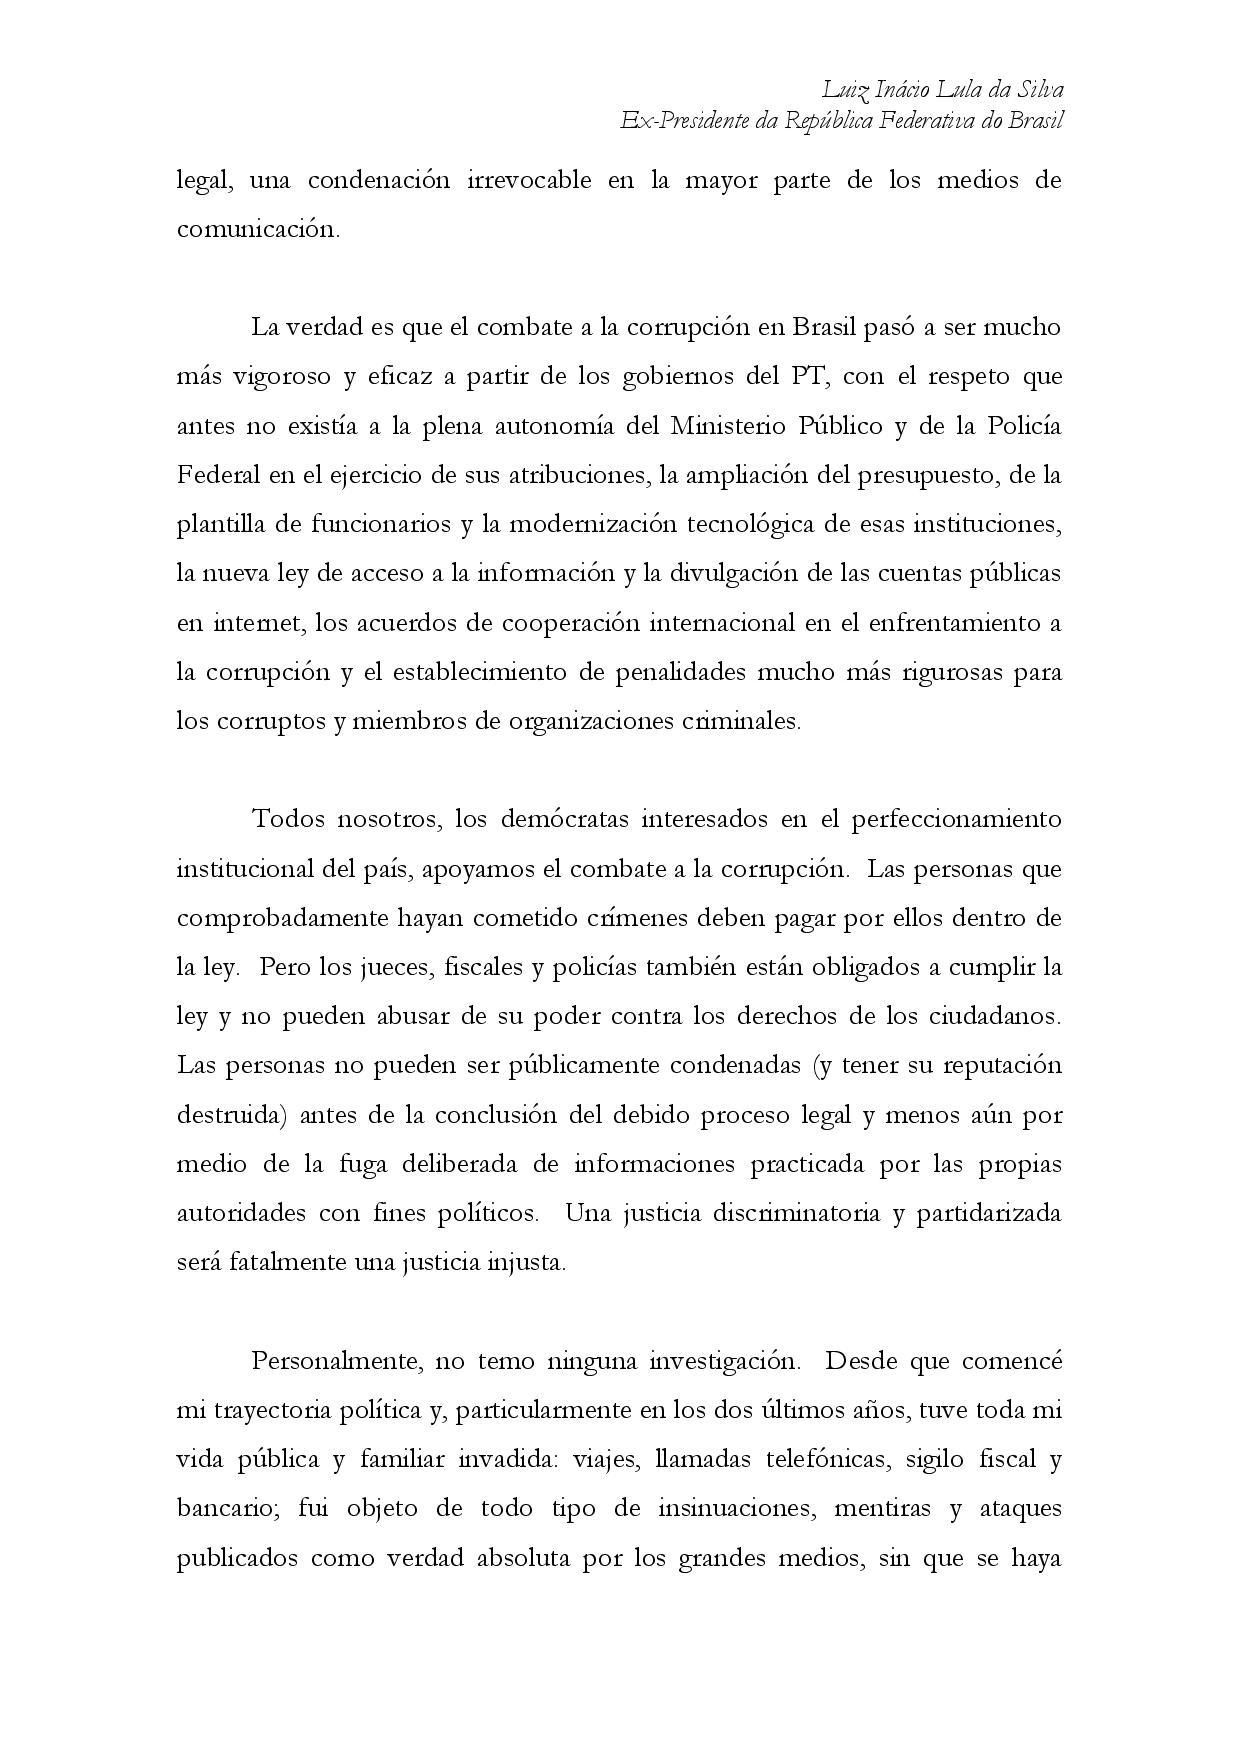 Argentina Ex-presidenta-page-005